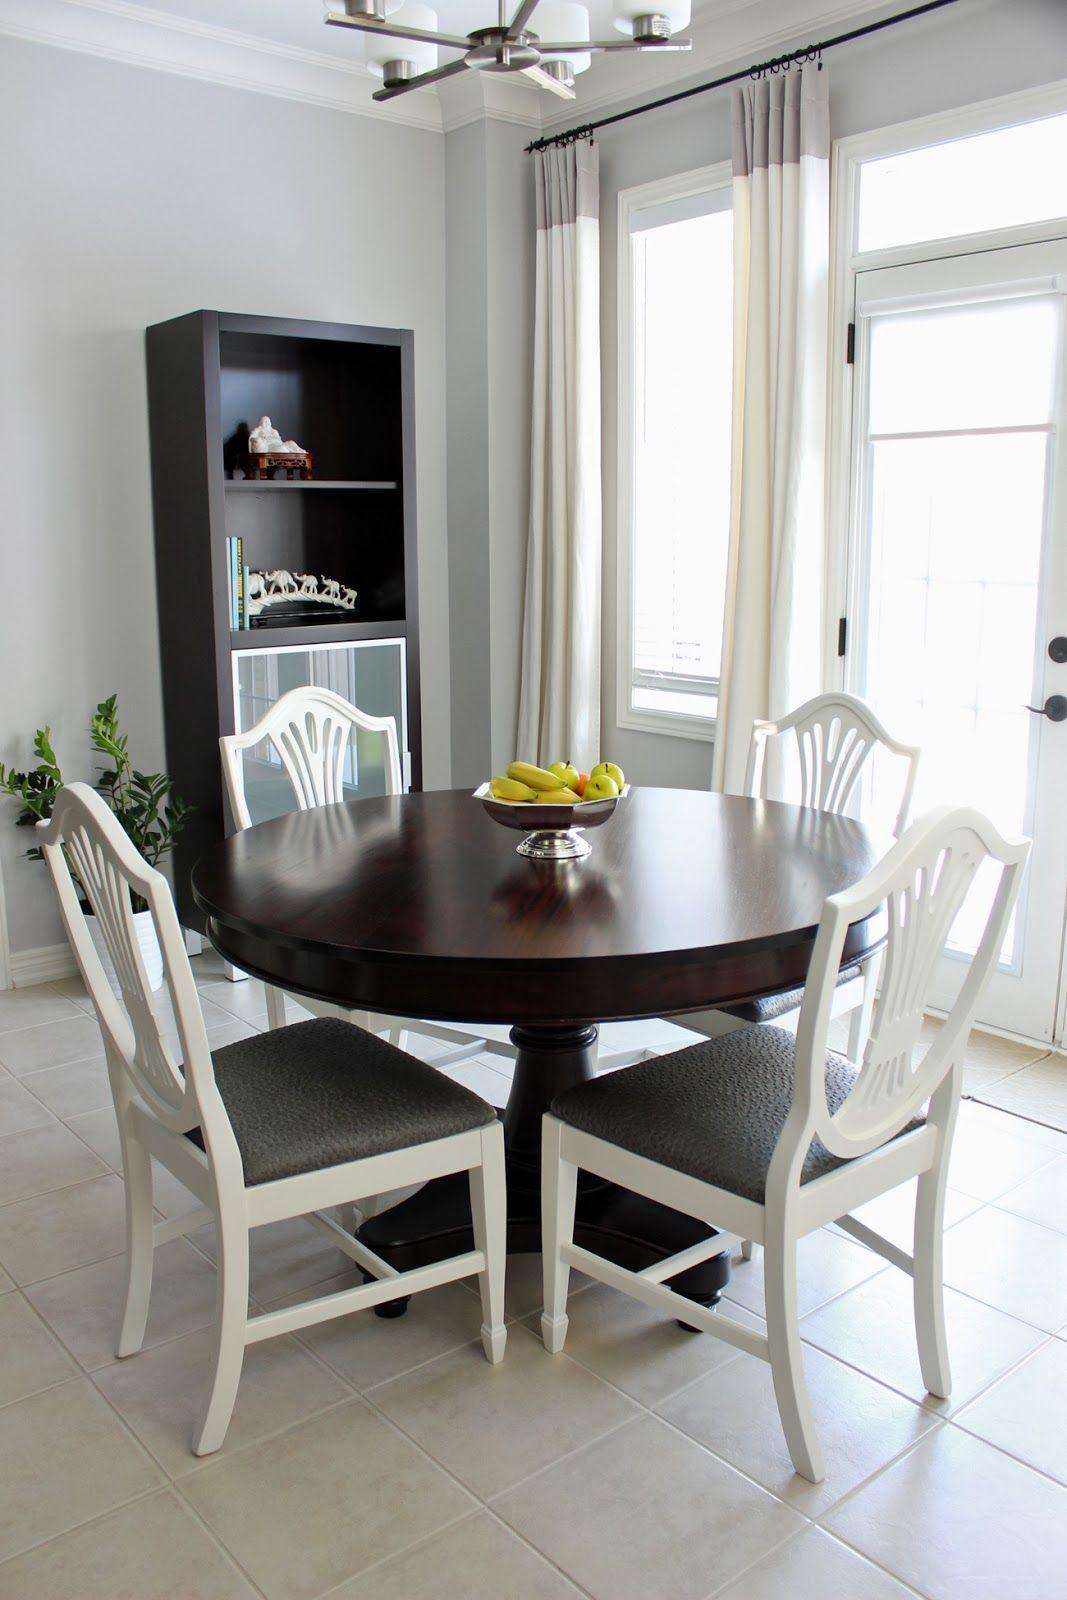 am dolce vita: antique shield back chair transformation, lenoir